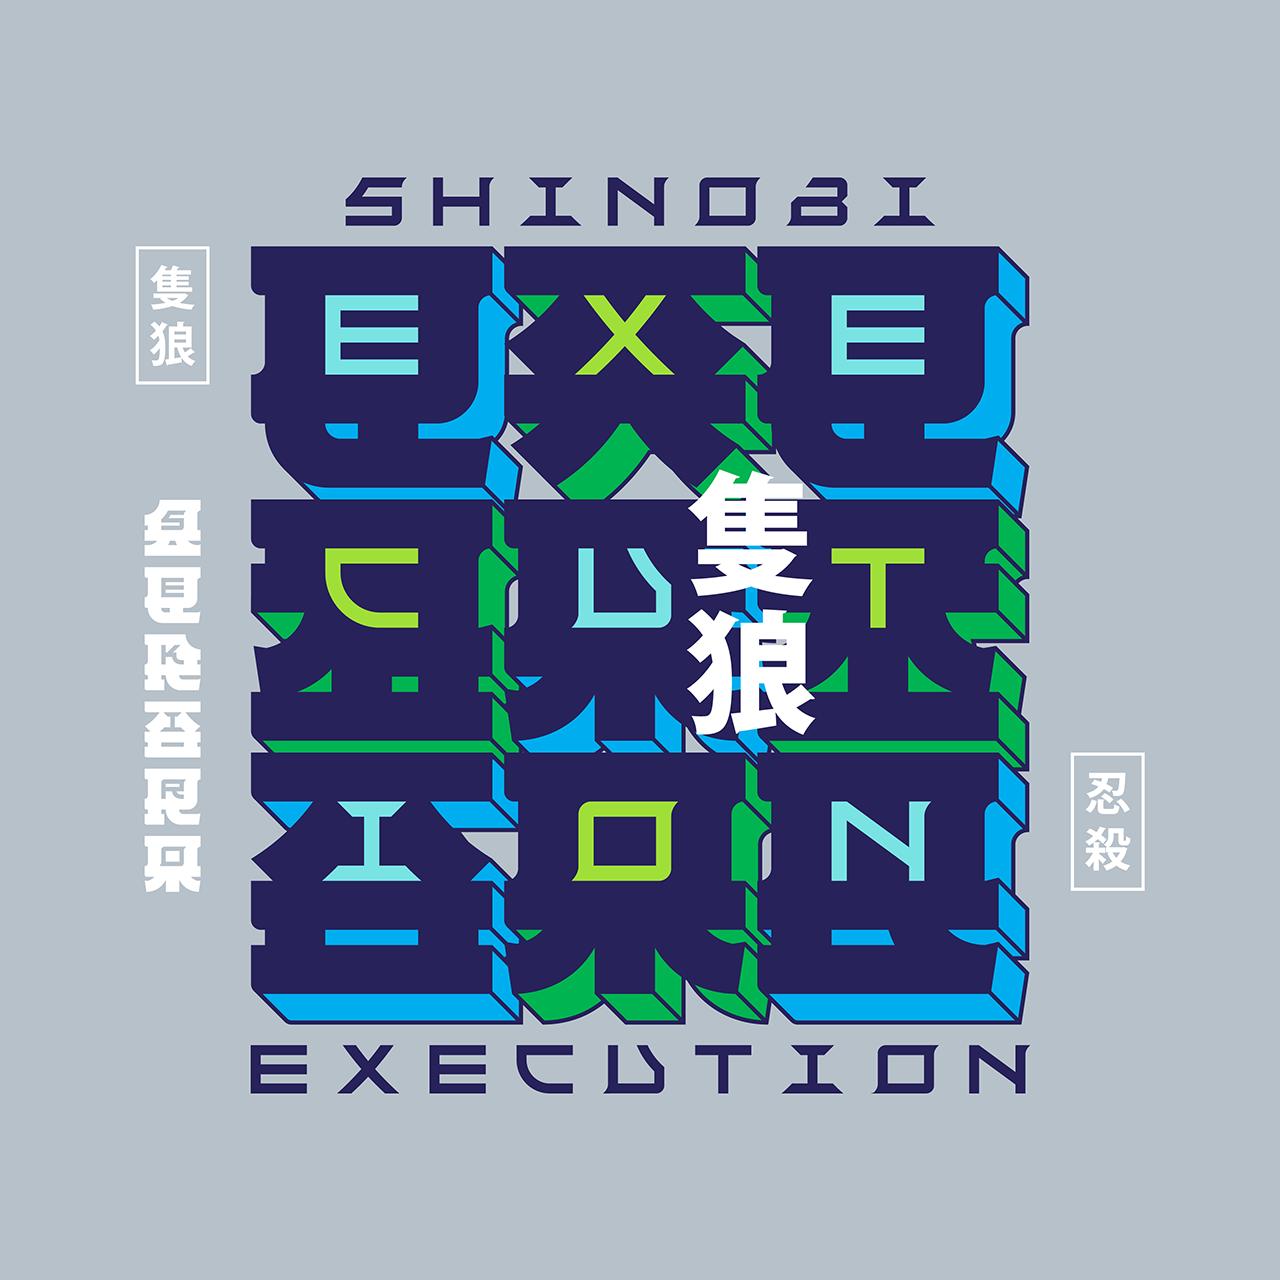 Katakana_Characters_FinalArt-22.png